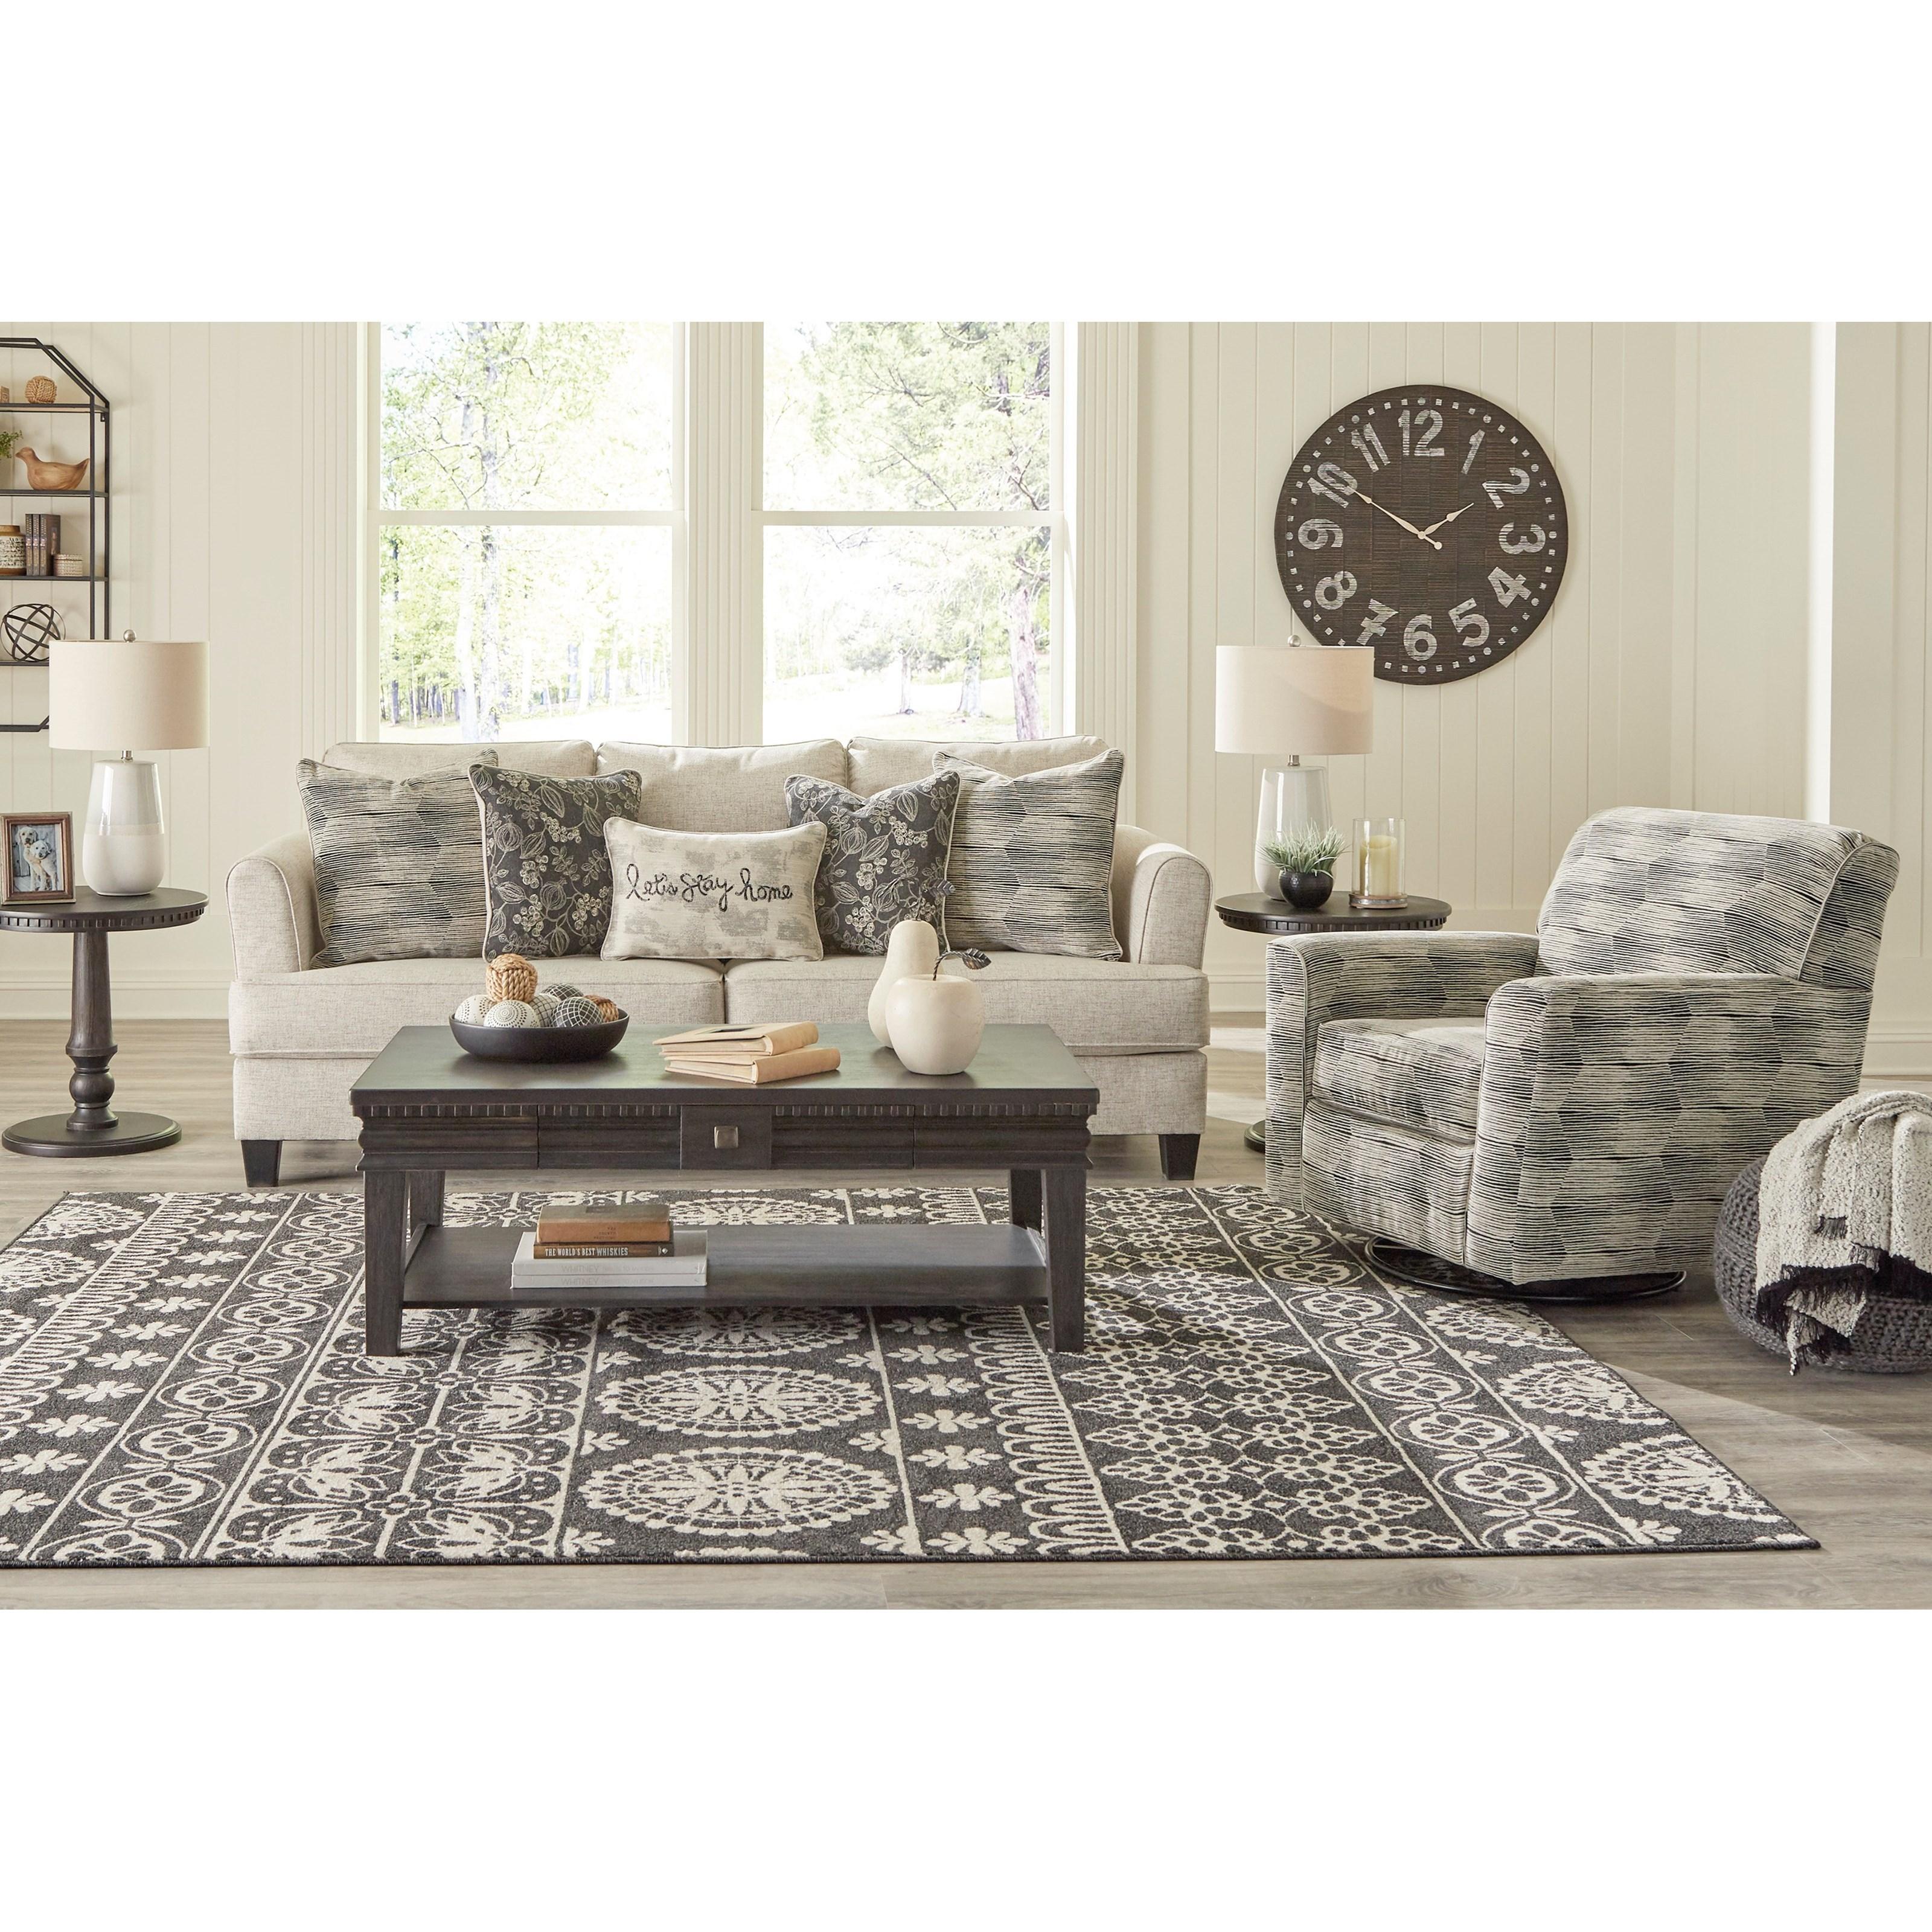 Callisburg Living Room Group by Benchcraft at Standard Furniture